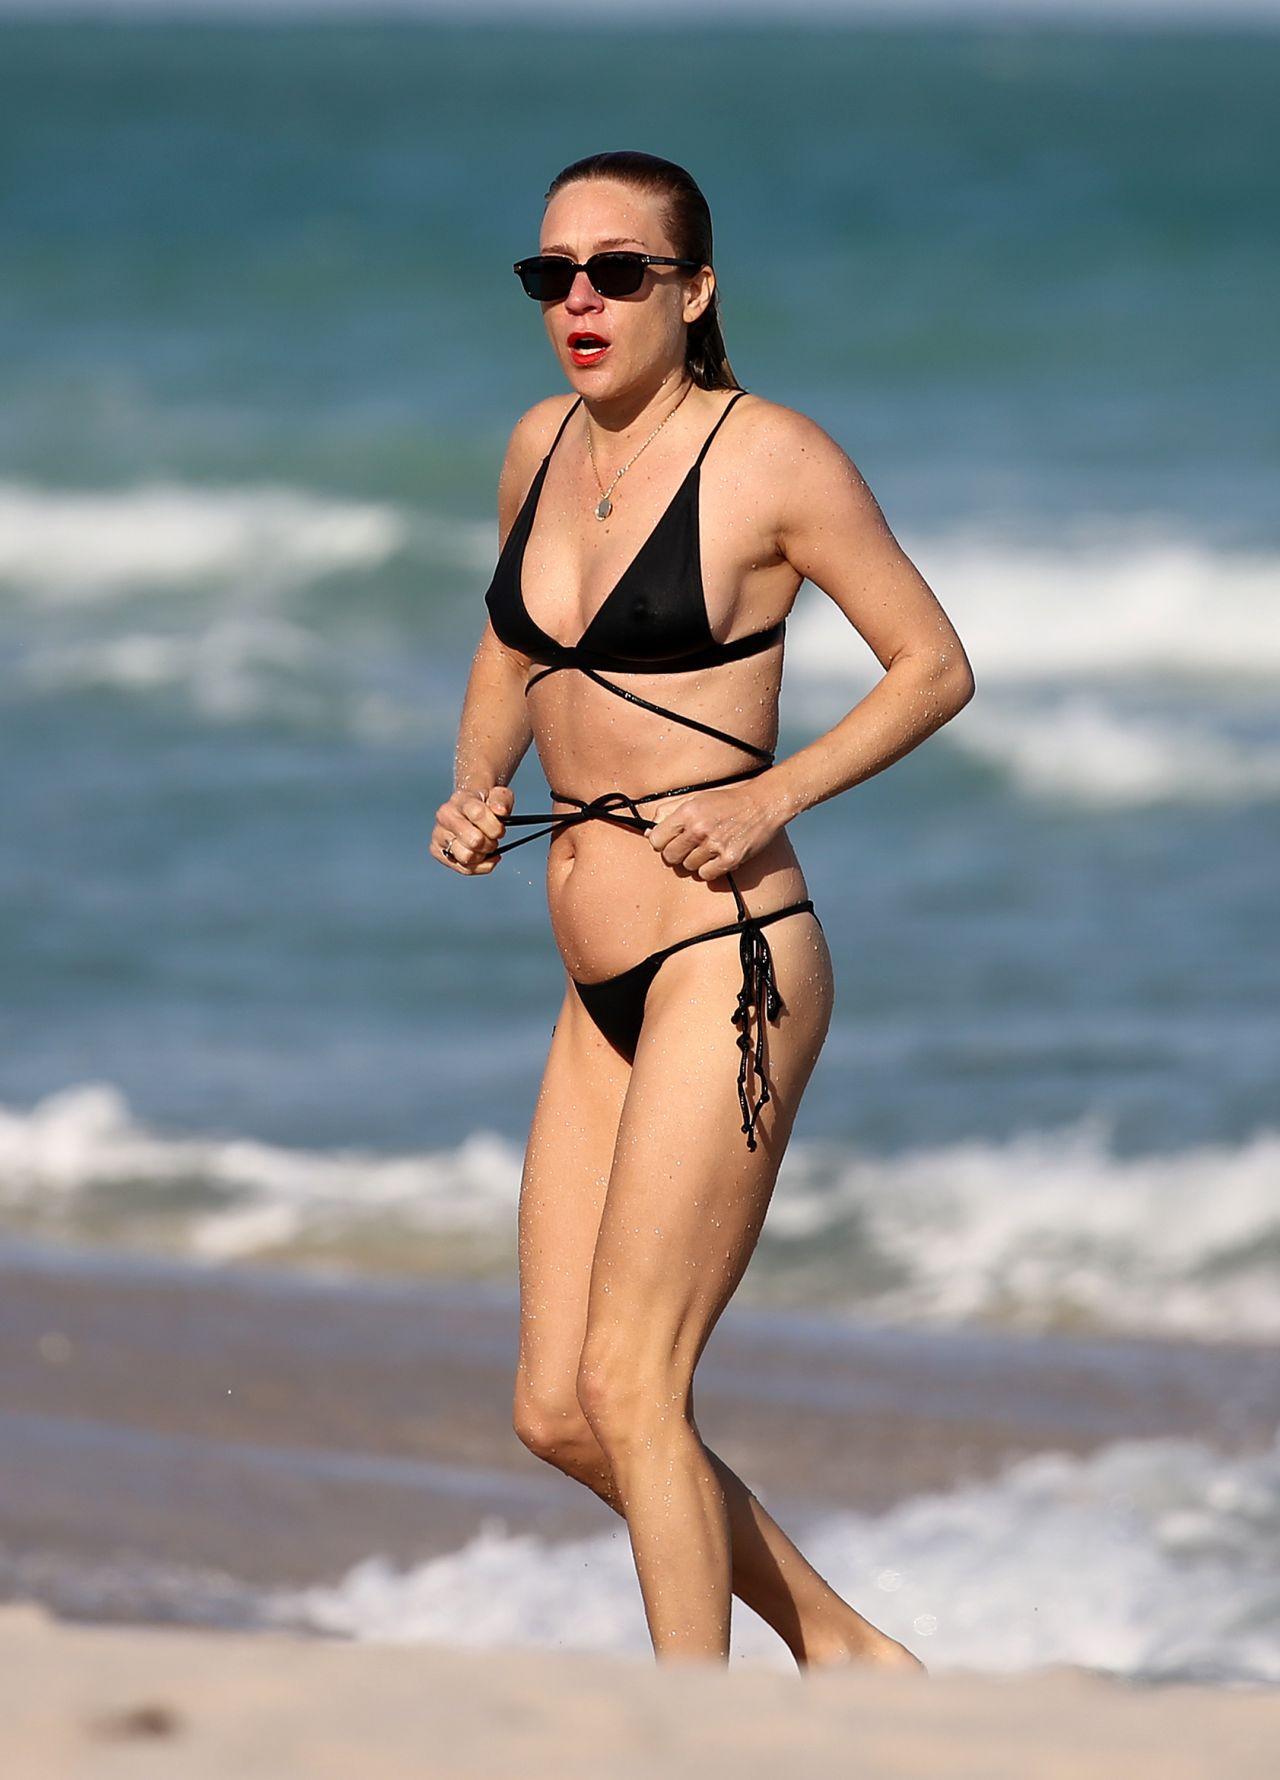 Bikini Chloe Sevigny nudes (81 photos), Tits, Is a cute, Twitter, underwear 2017